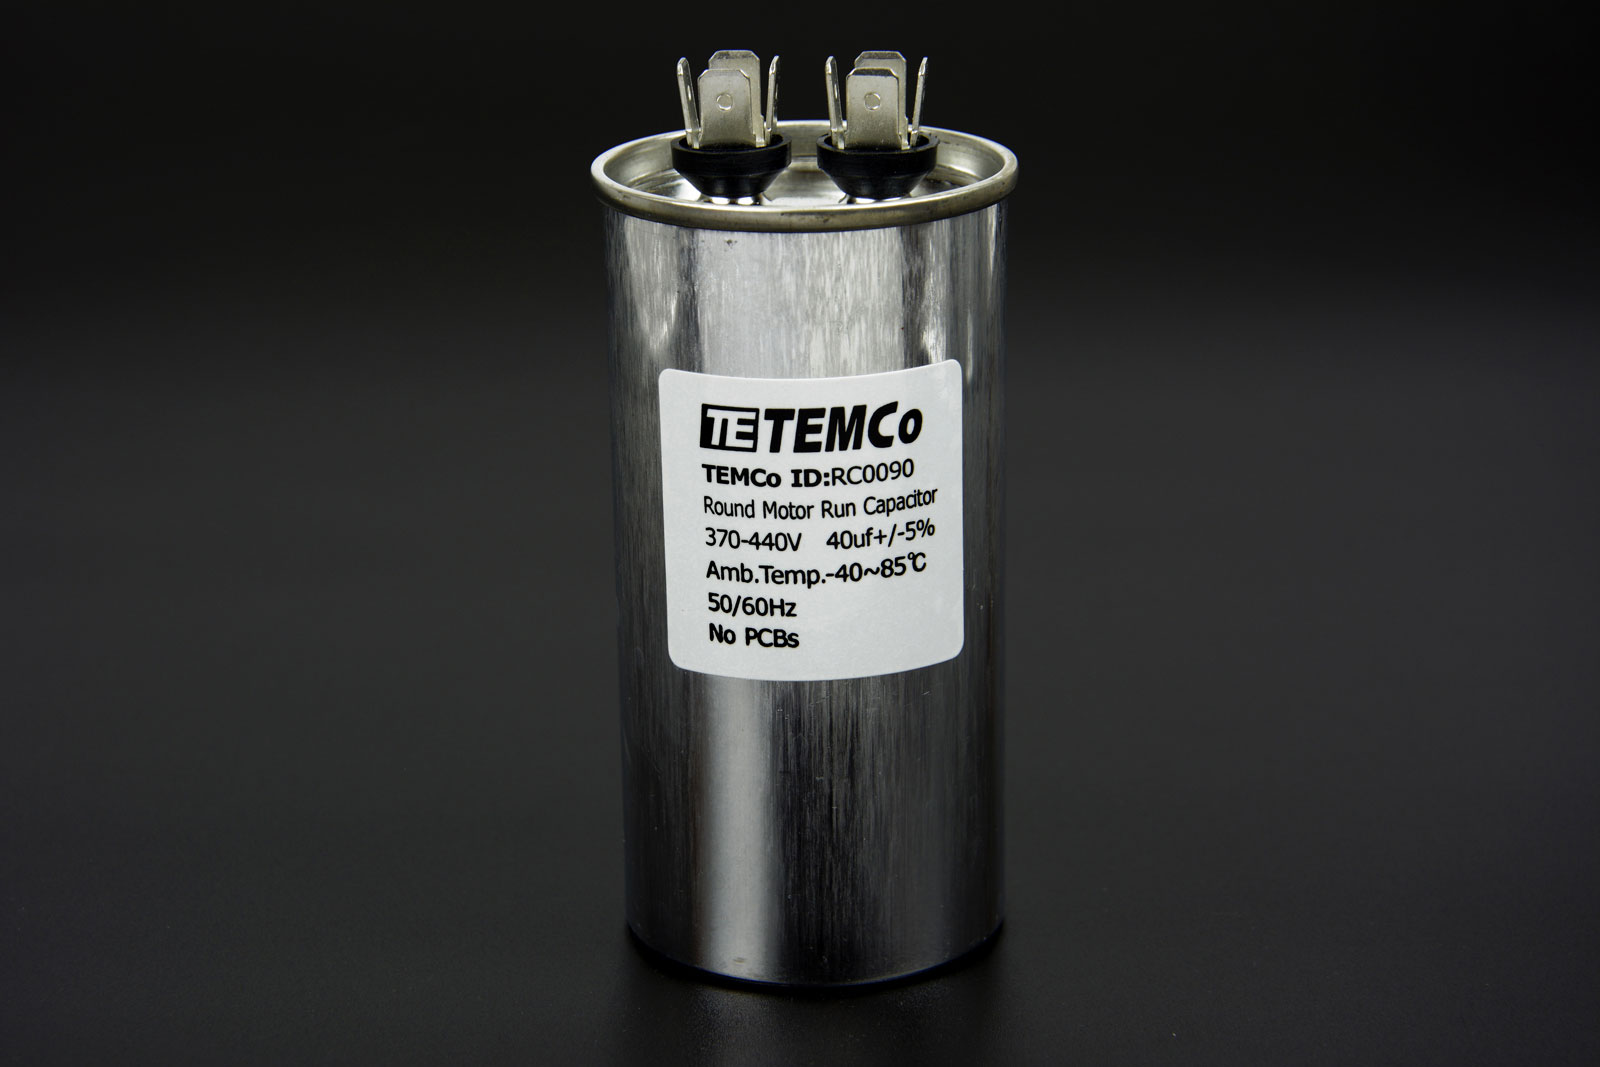 temco 40 mfd uf run capacitor 440 vac volts ac motor hvac